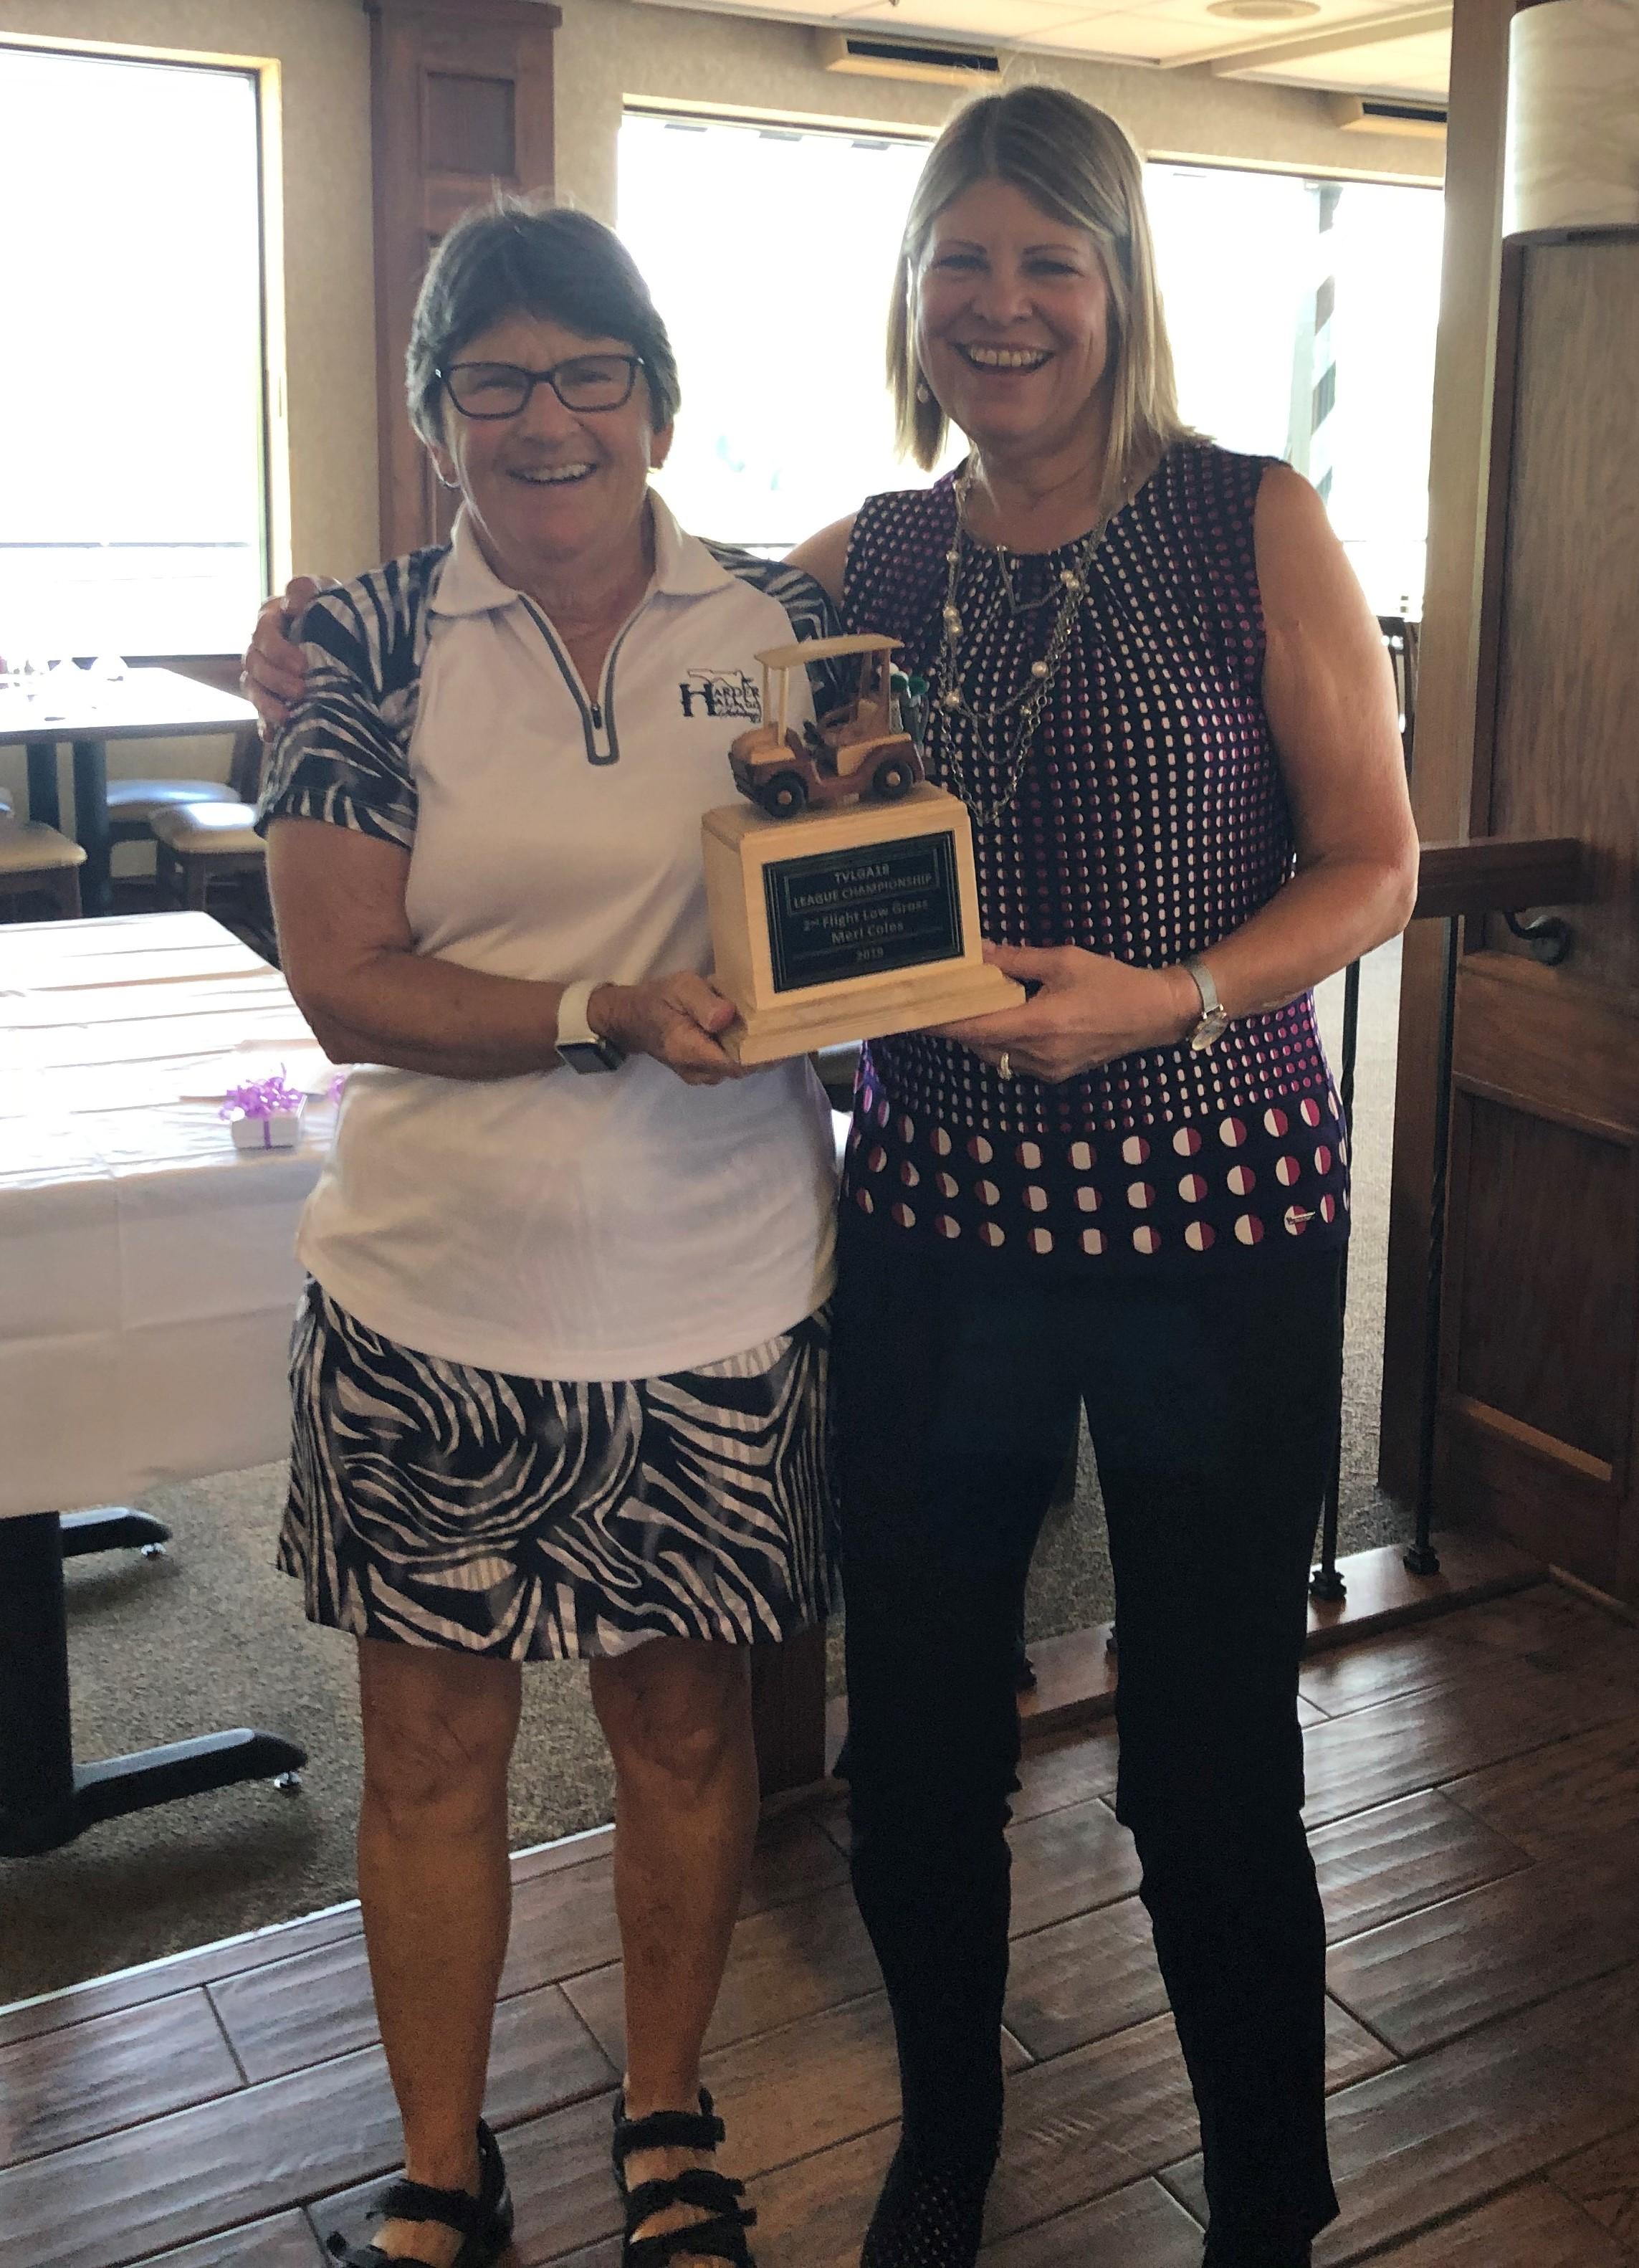 Meri Coles - League Championship Award